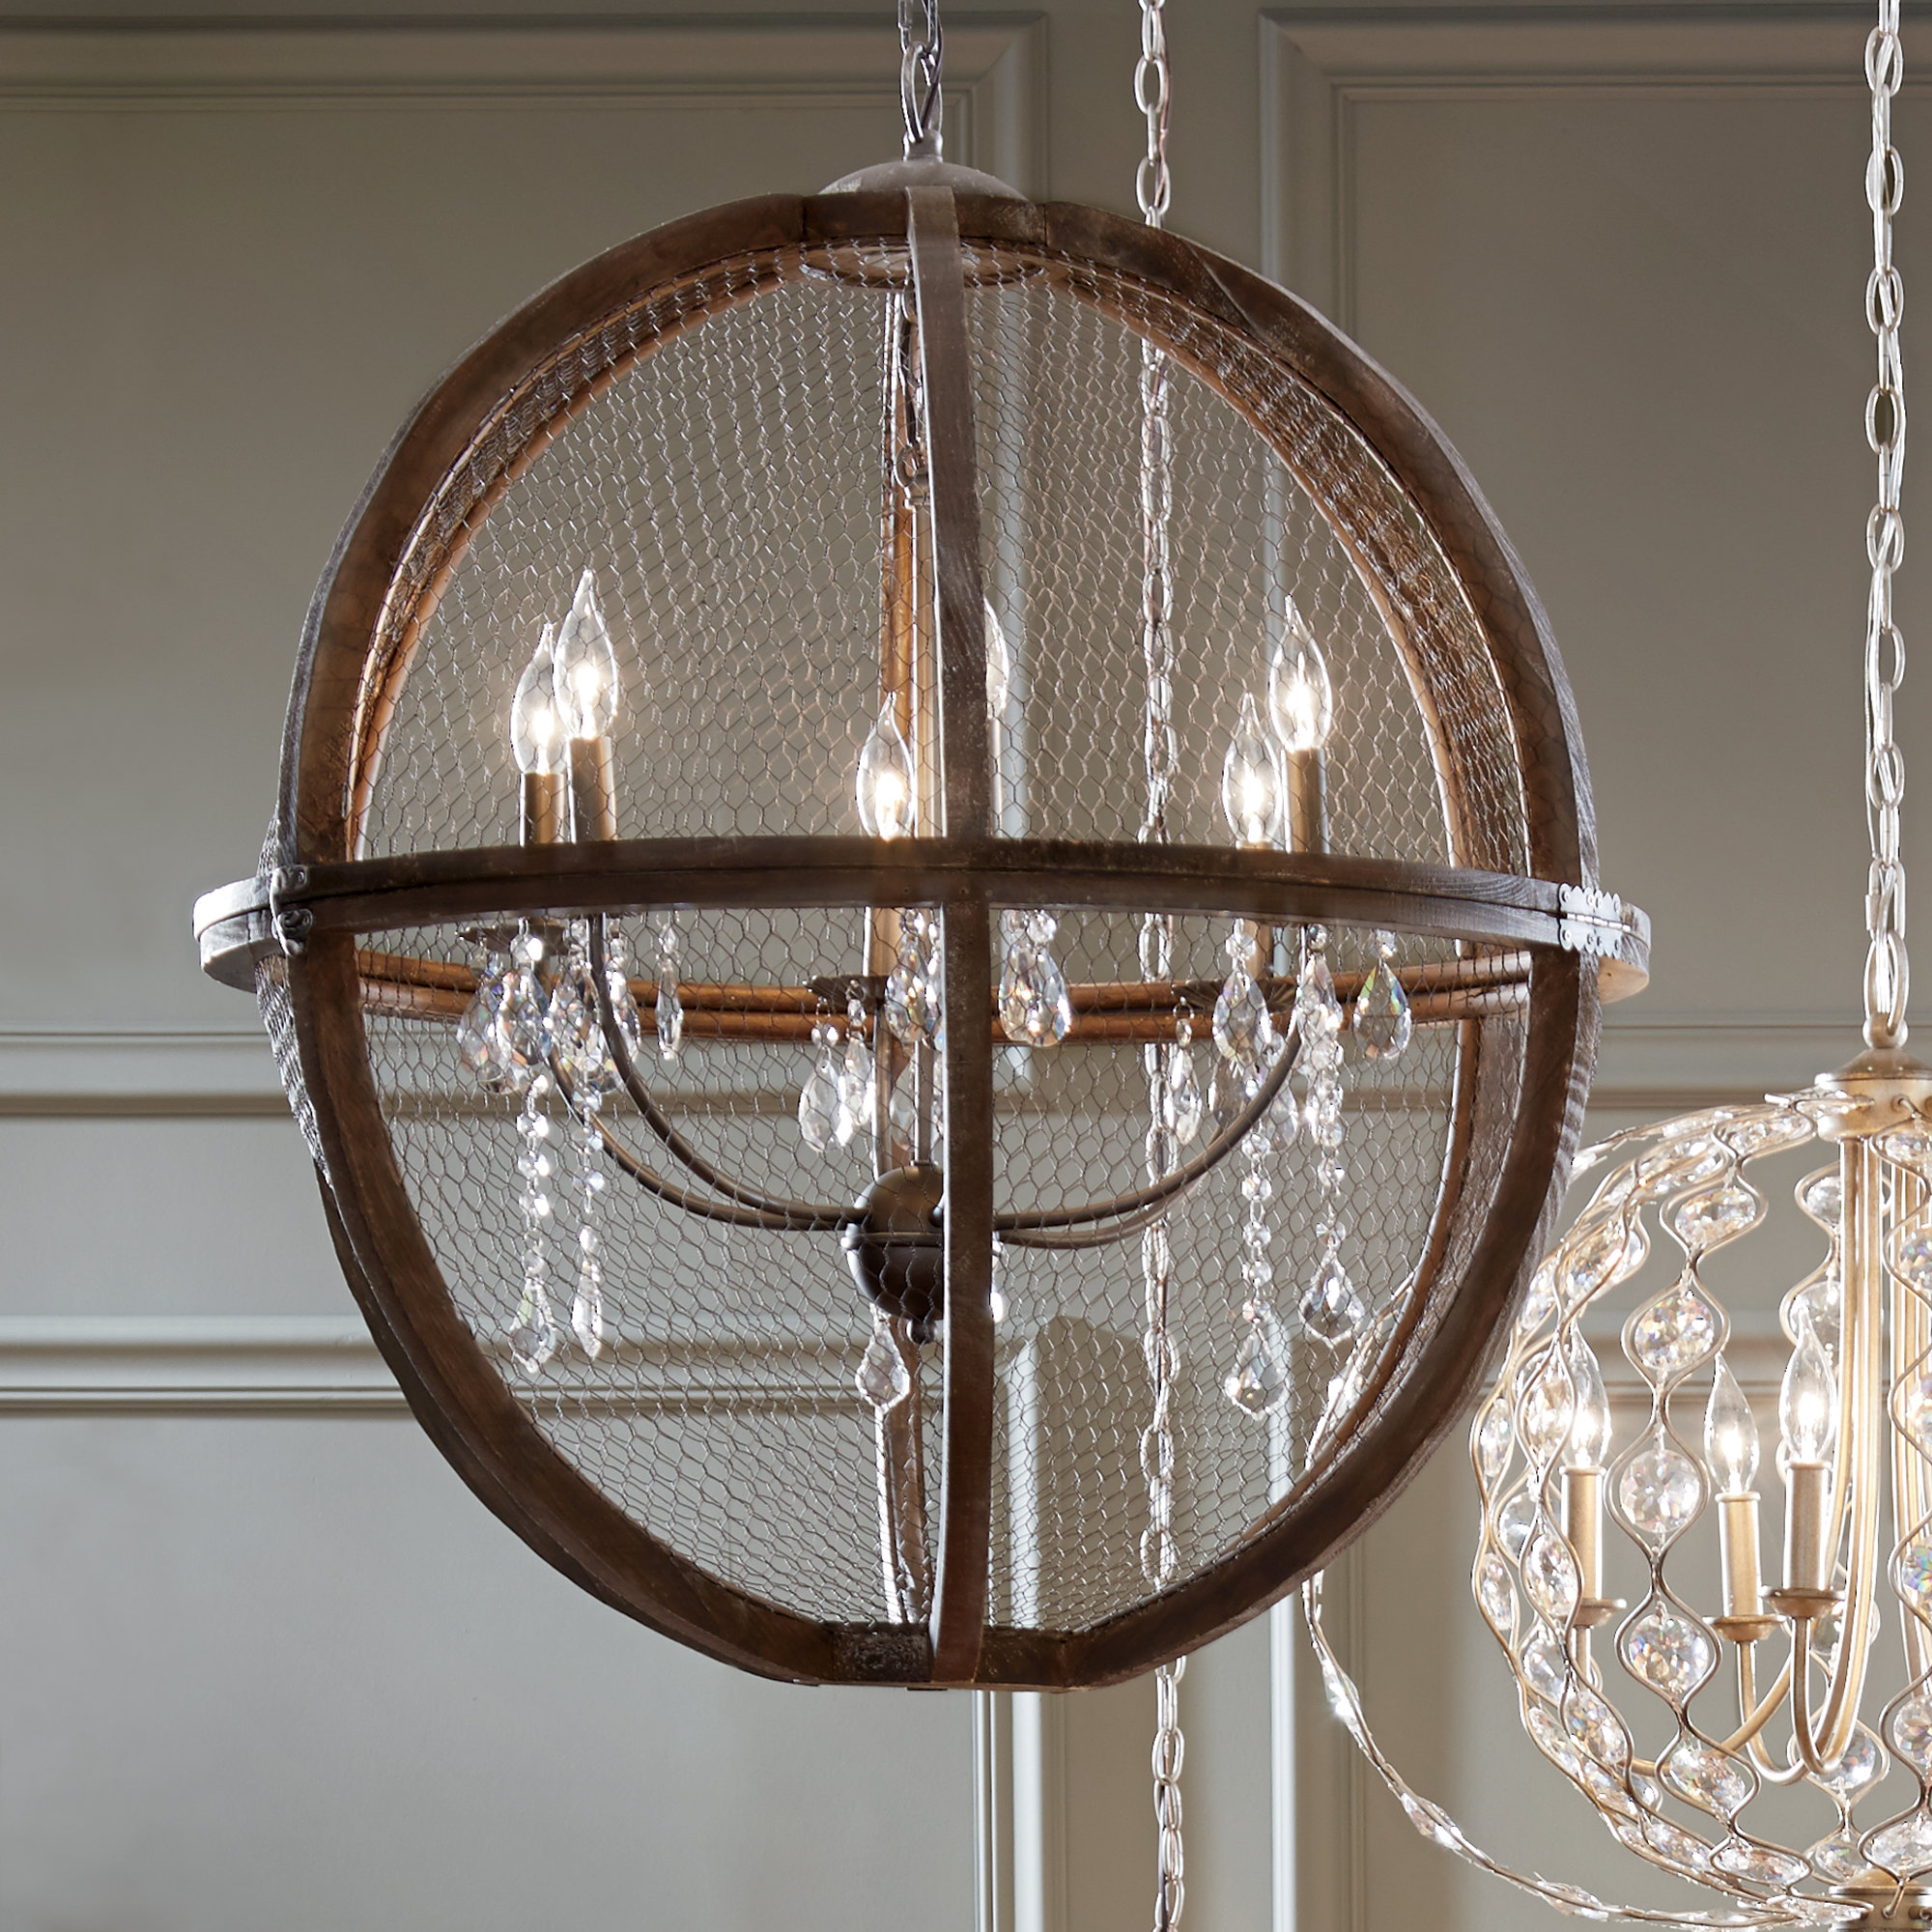 Rosemont 6 Light Globe Chandelier For Widely Used Alden 6 Light Globe Chandeliers (Gallery 6 of 20)